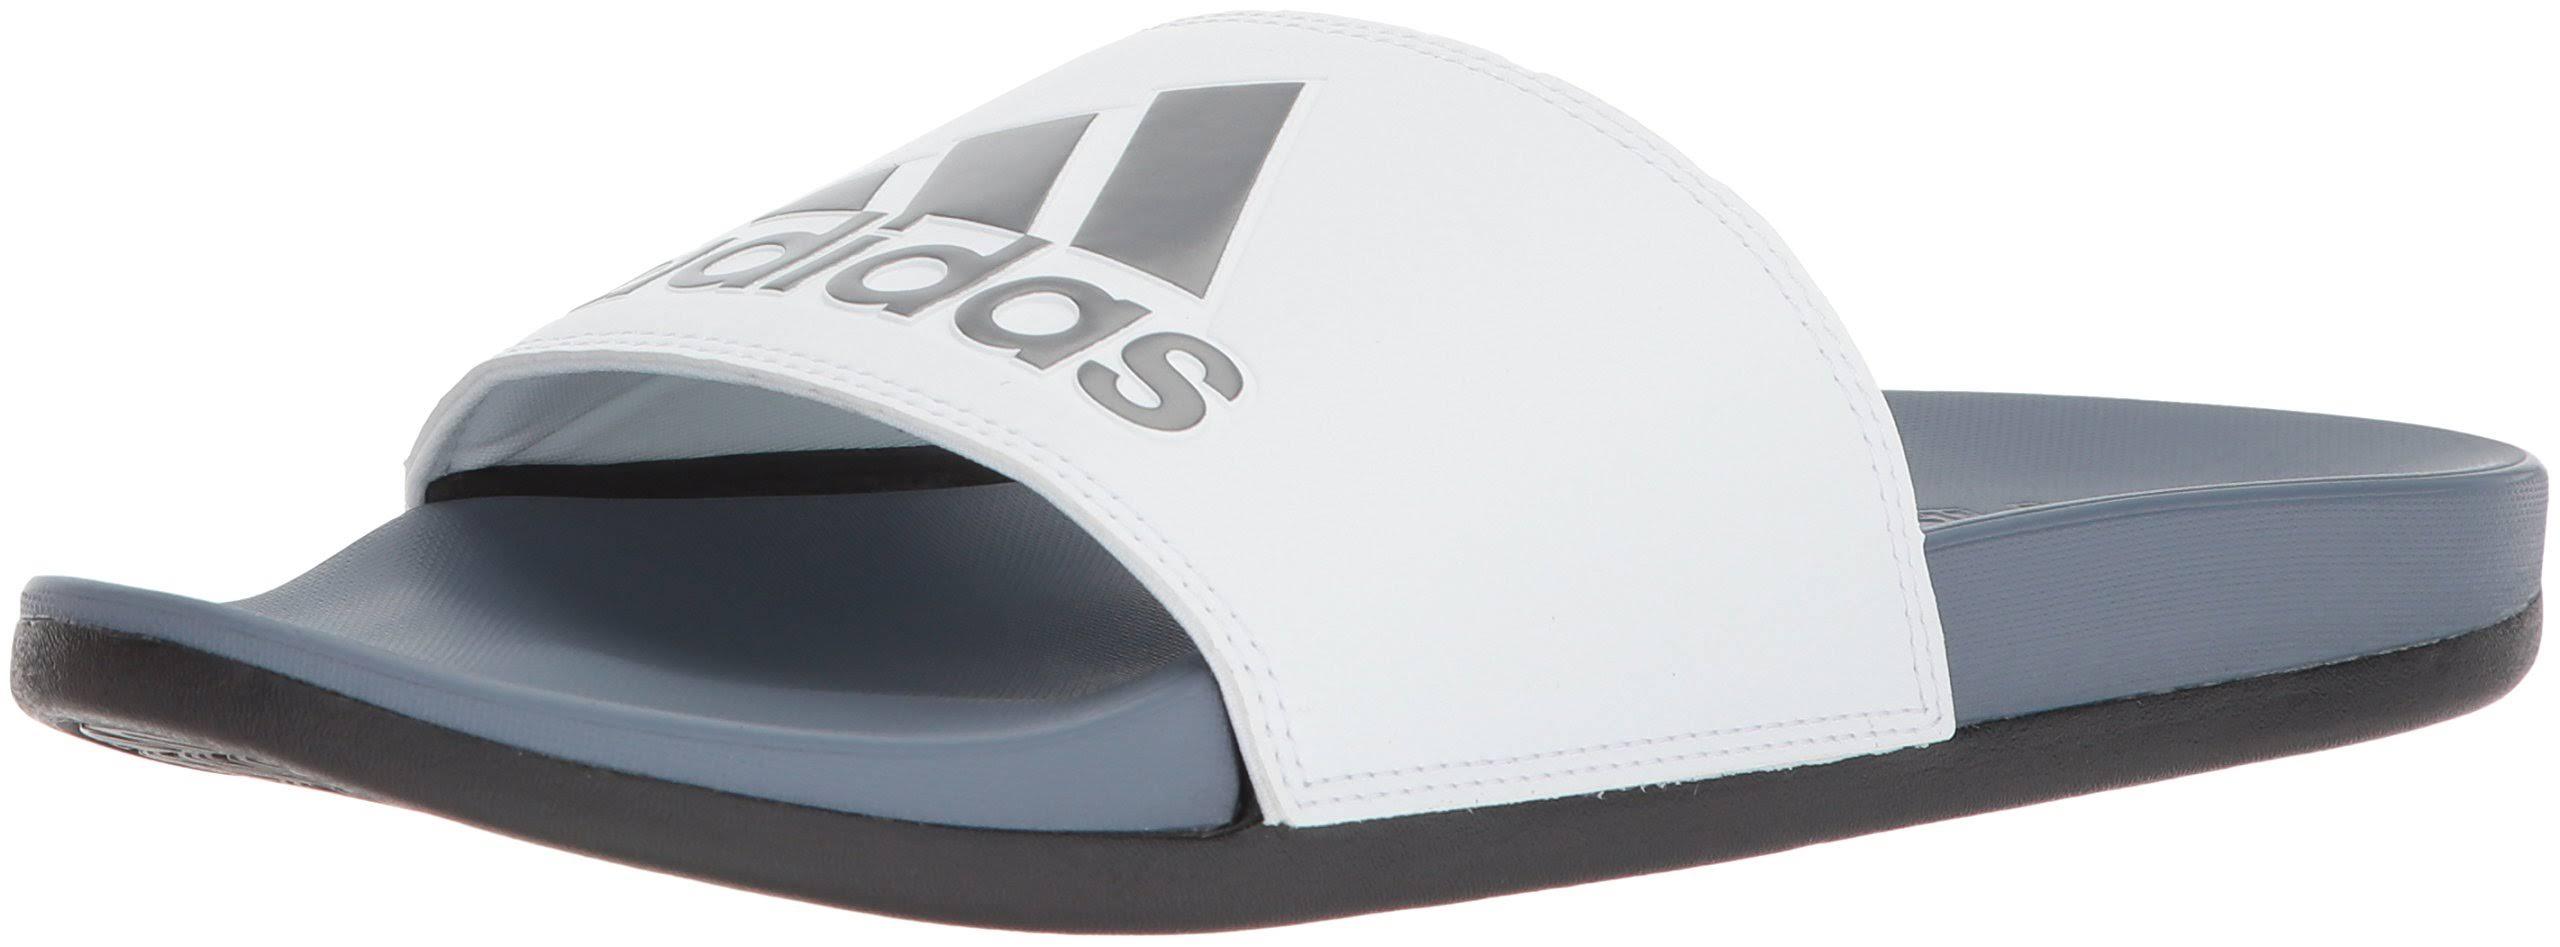 Black core Comfort Slides footwear White Steel Raw Adidas Men's Adilette Uqvw8Pz